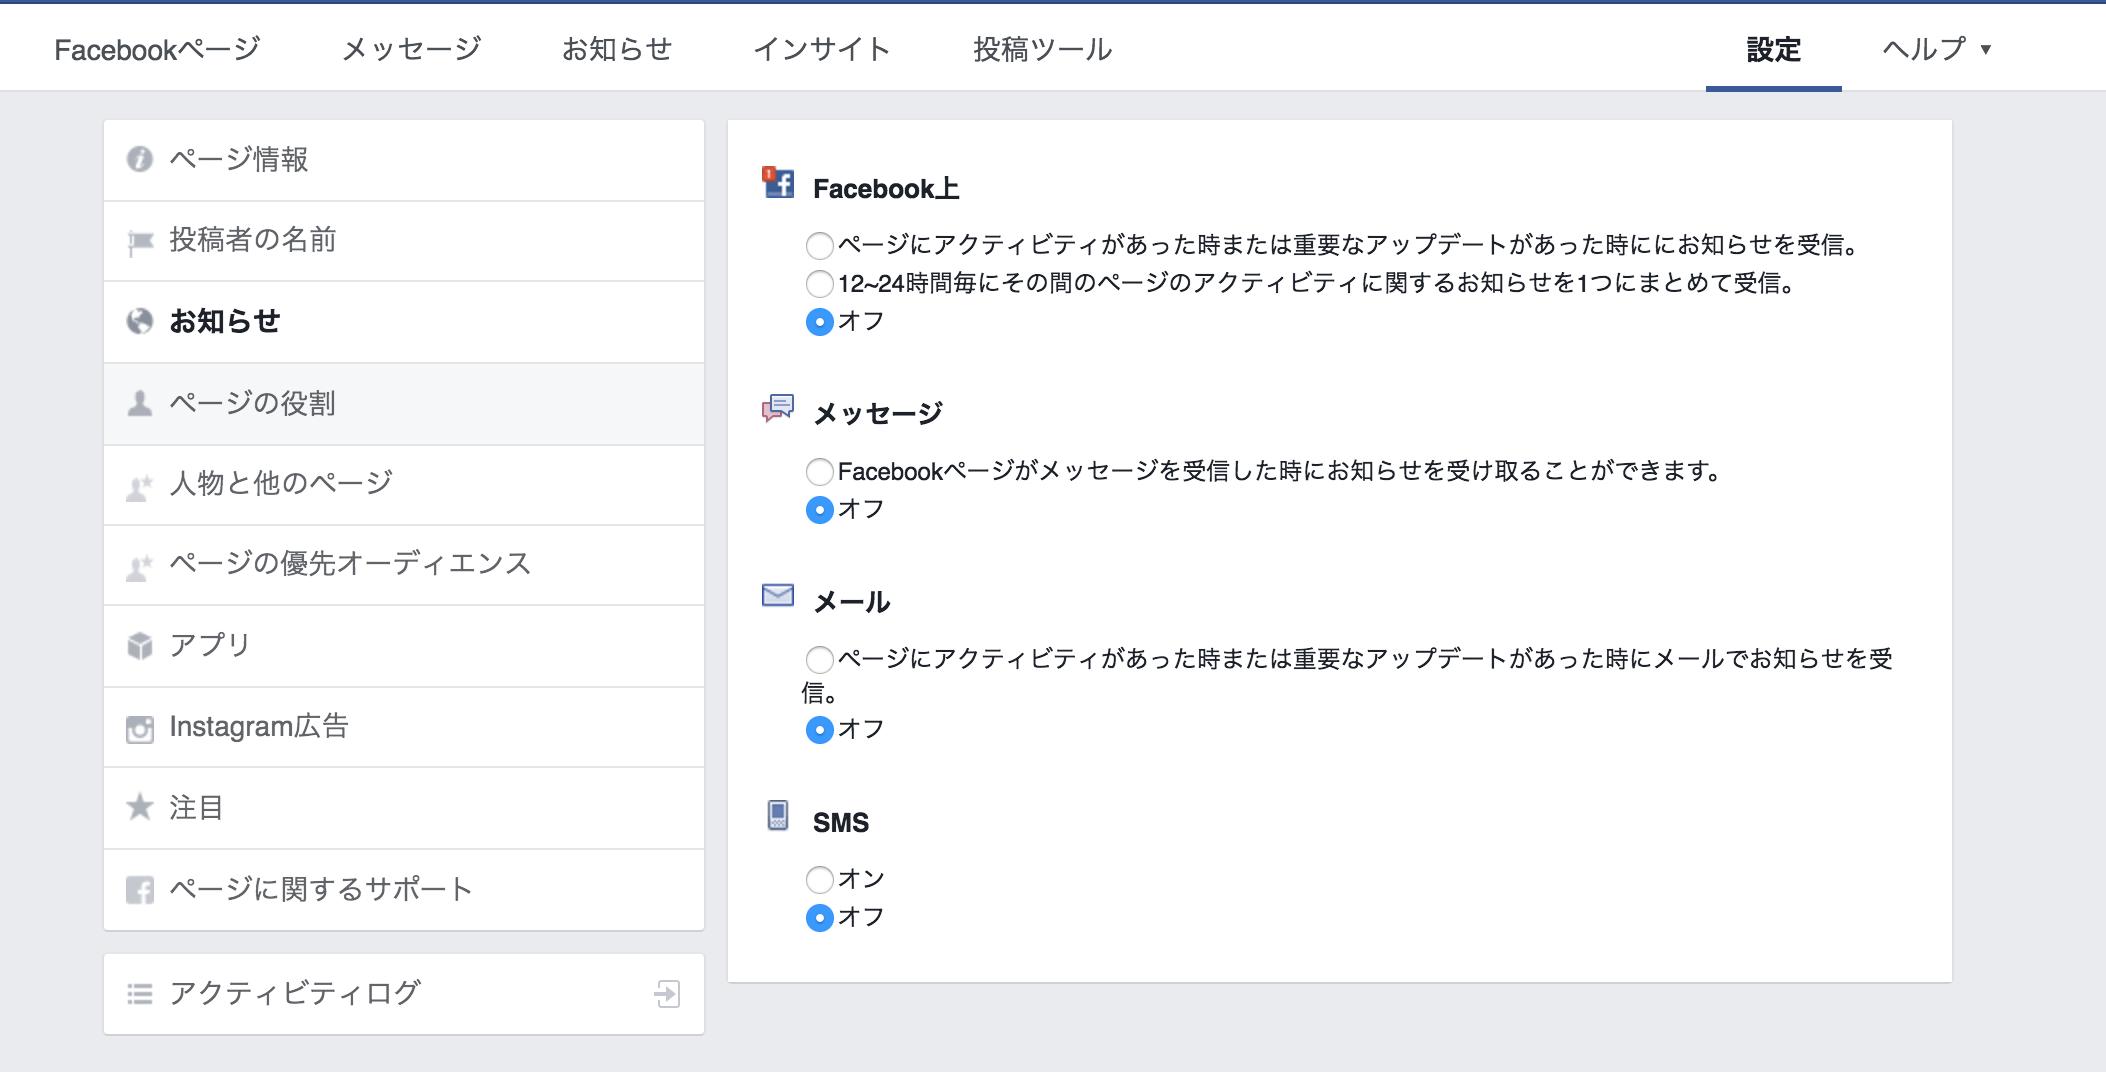 Facebookページからの不要な通知を削除する